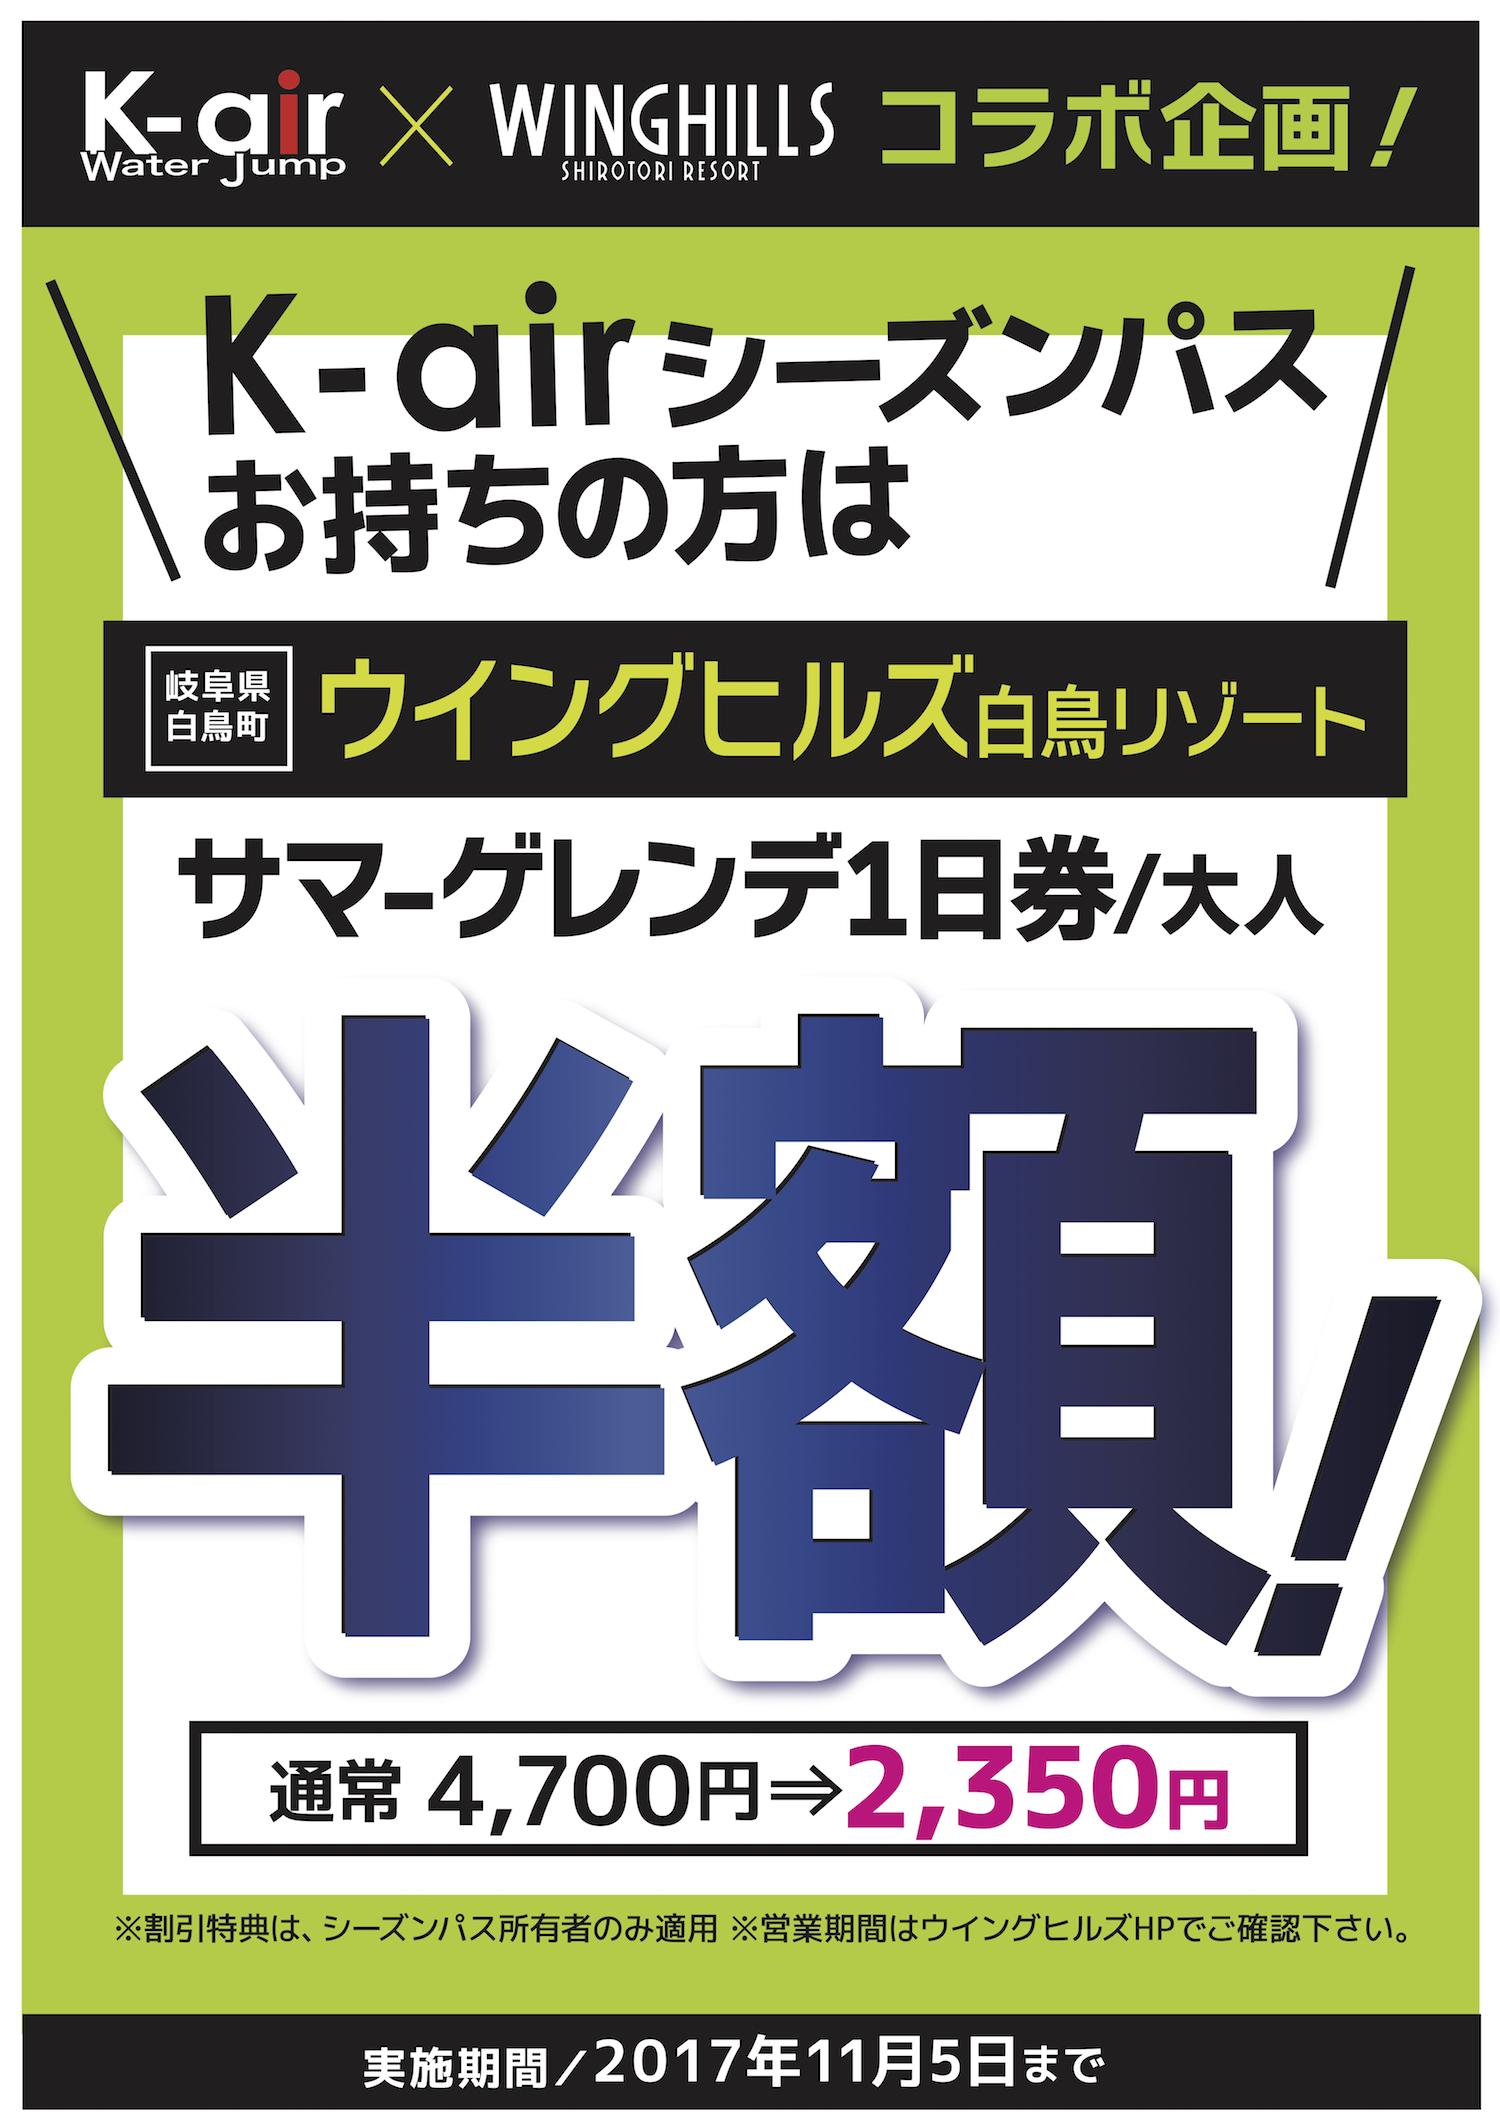 K-air様用 コラボ企画 A3 のコピー